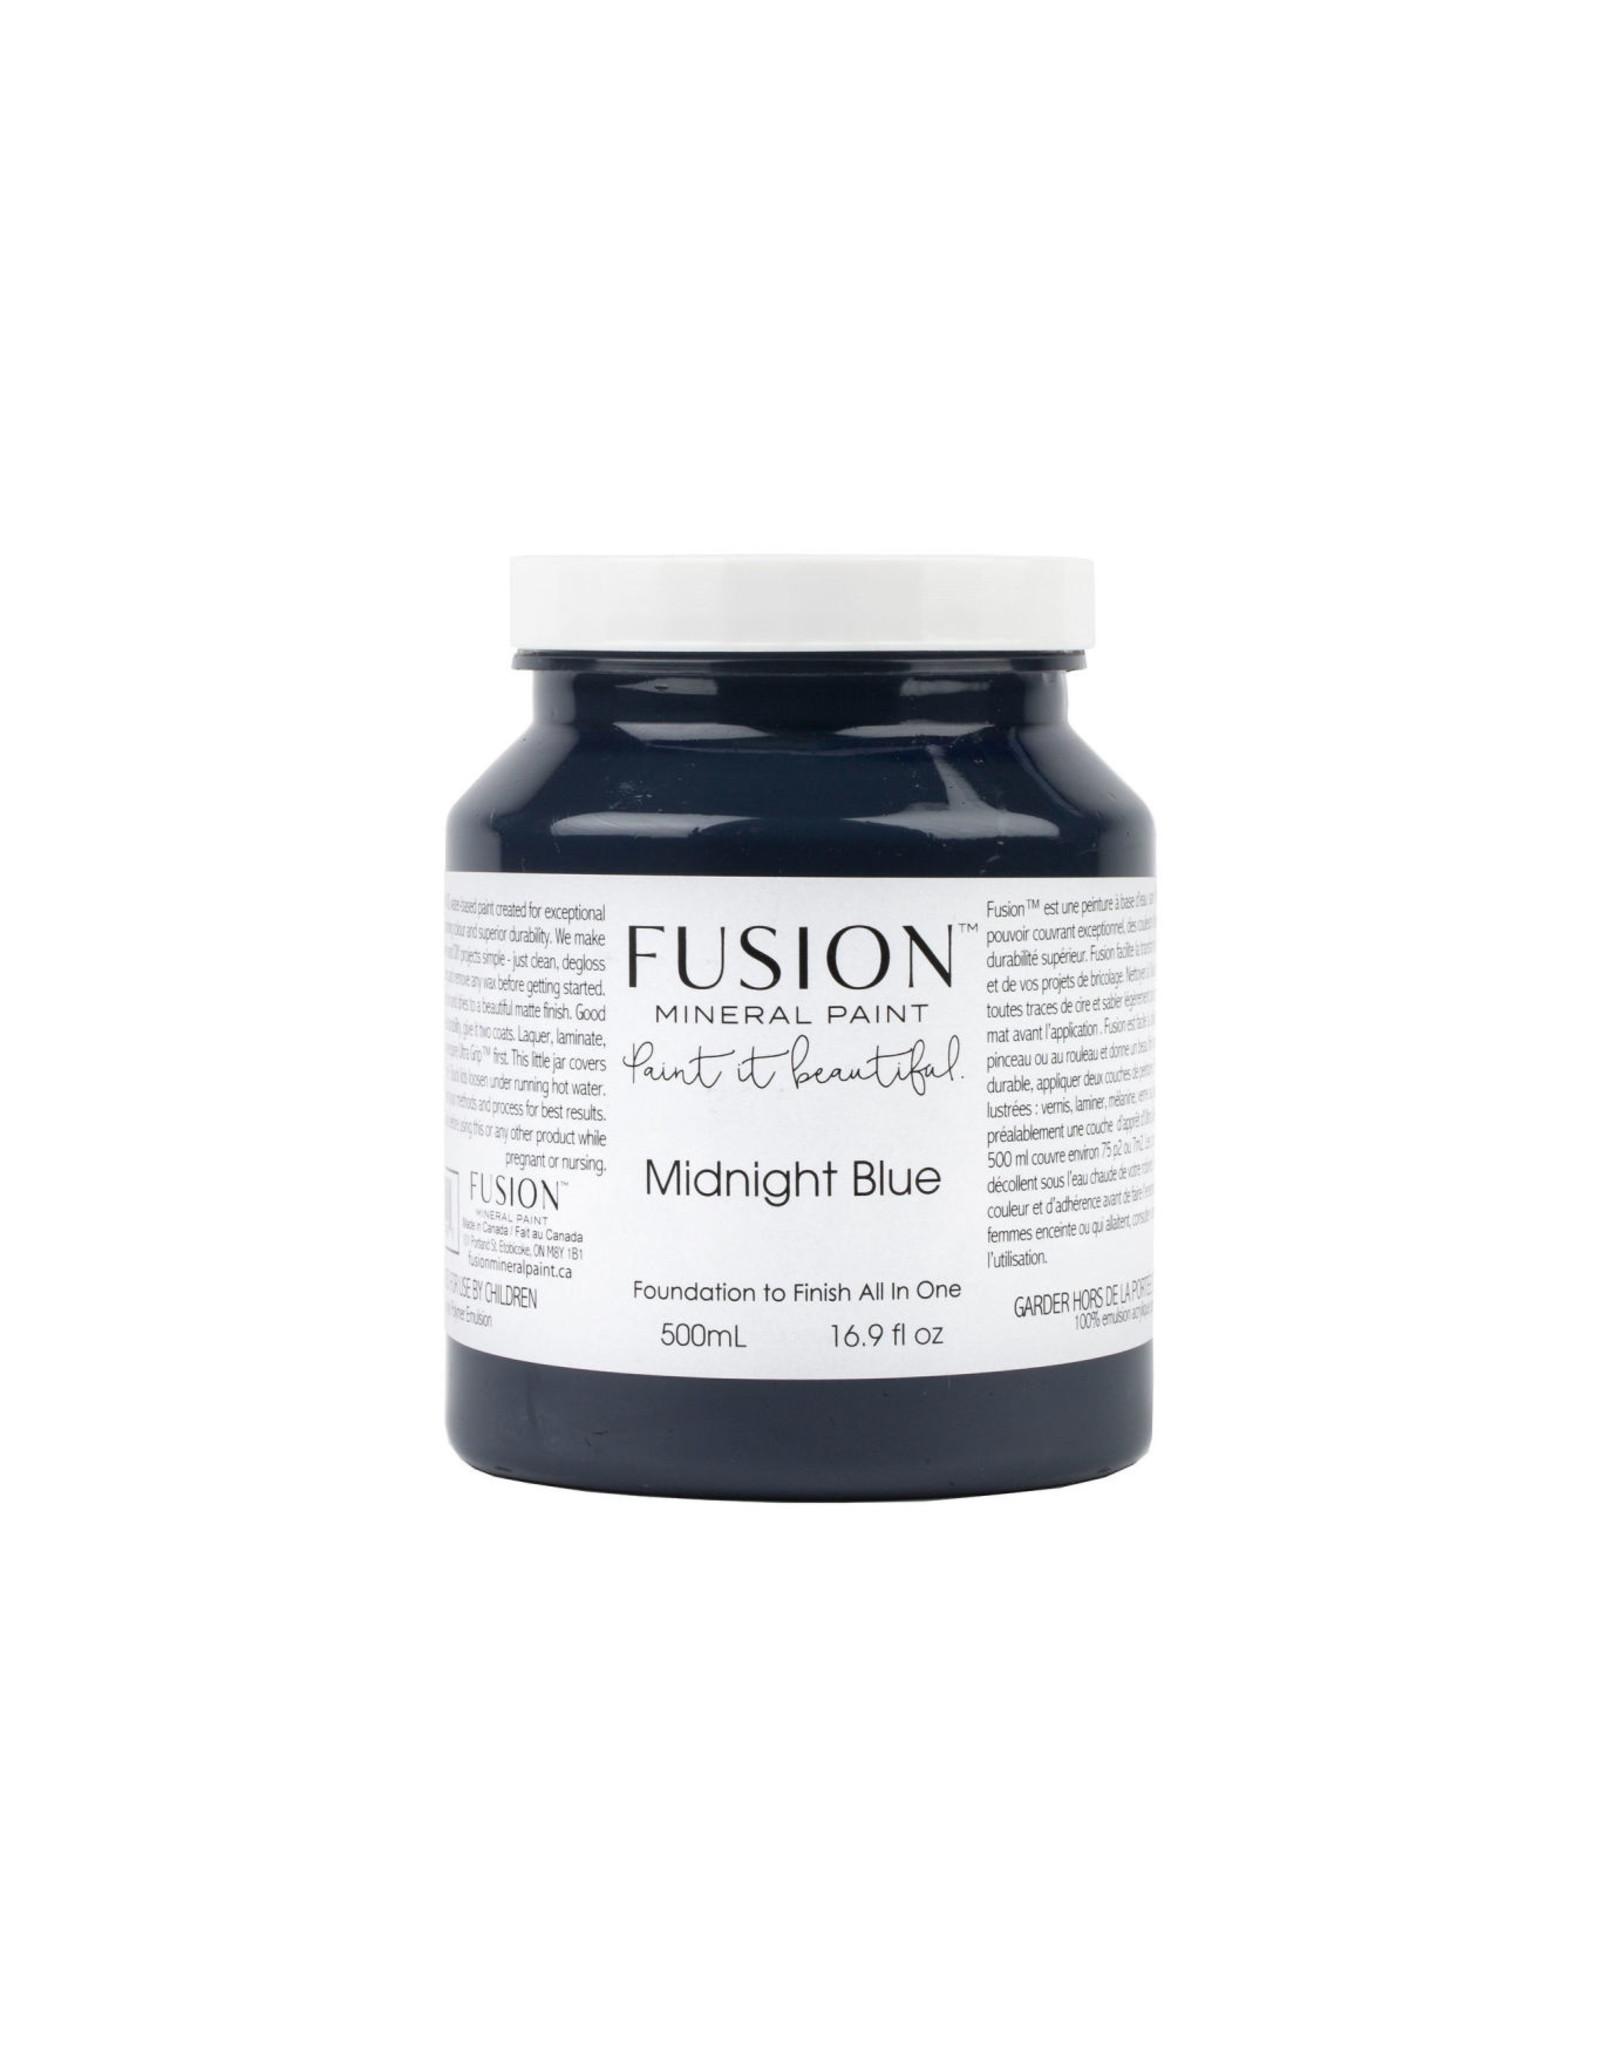 Fusion Mineral Paint Fusion Mineral Paint - Midnight Blue 500ml